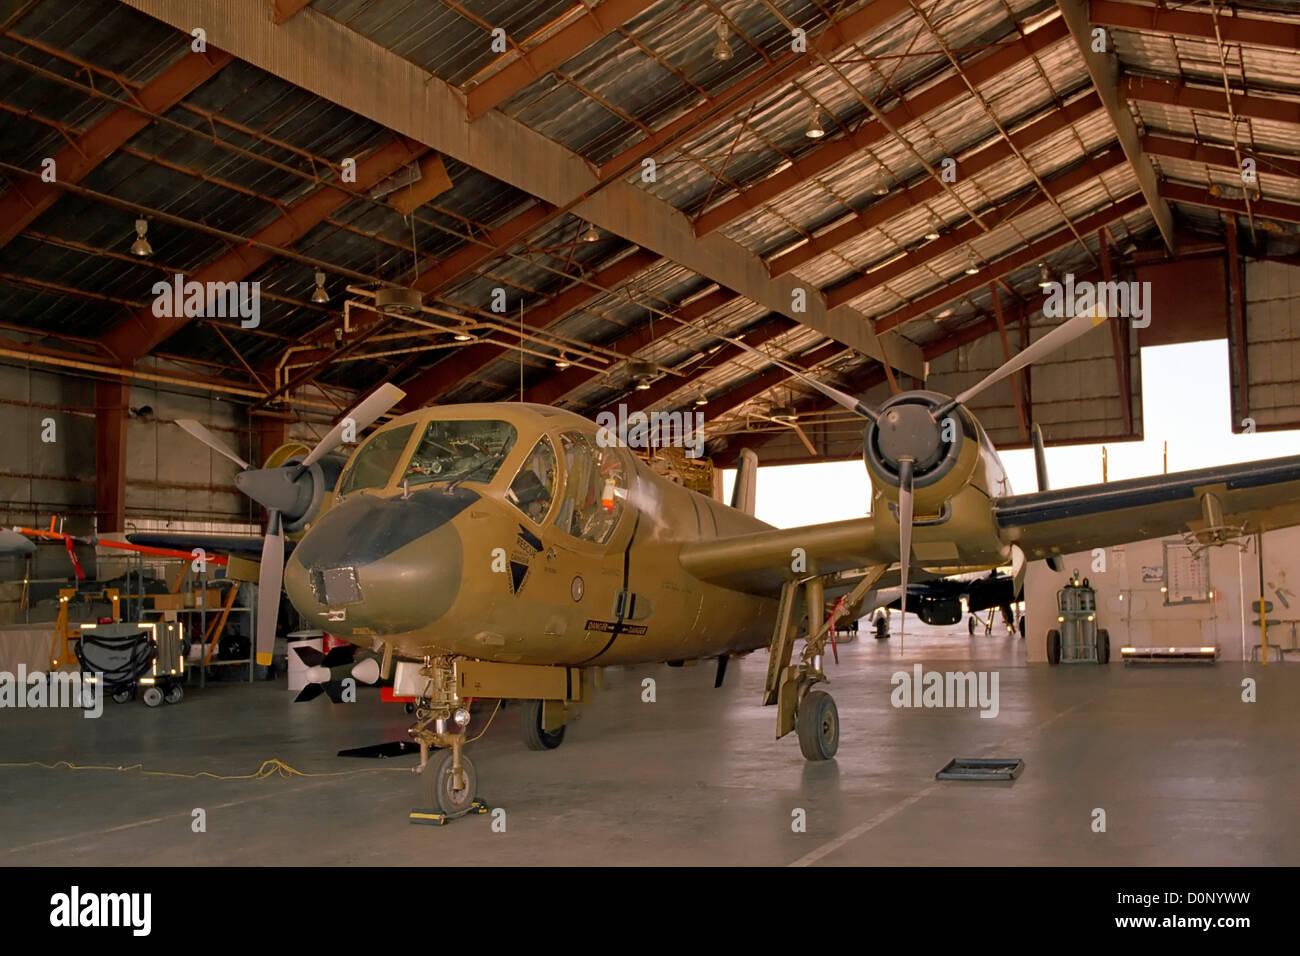 Grumman OV-1C in Hanger - Stock Image